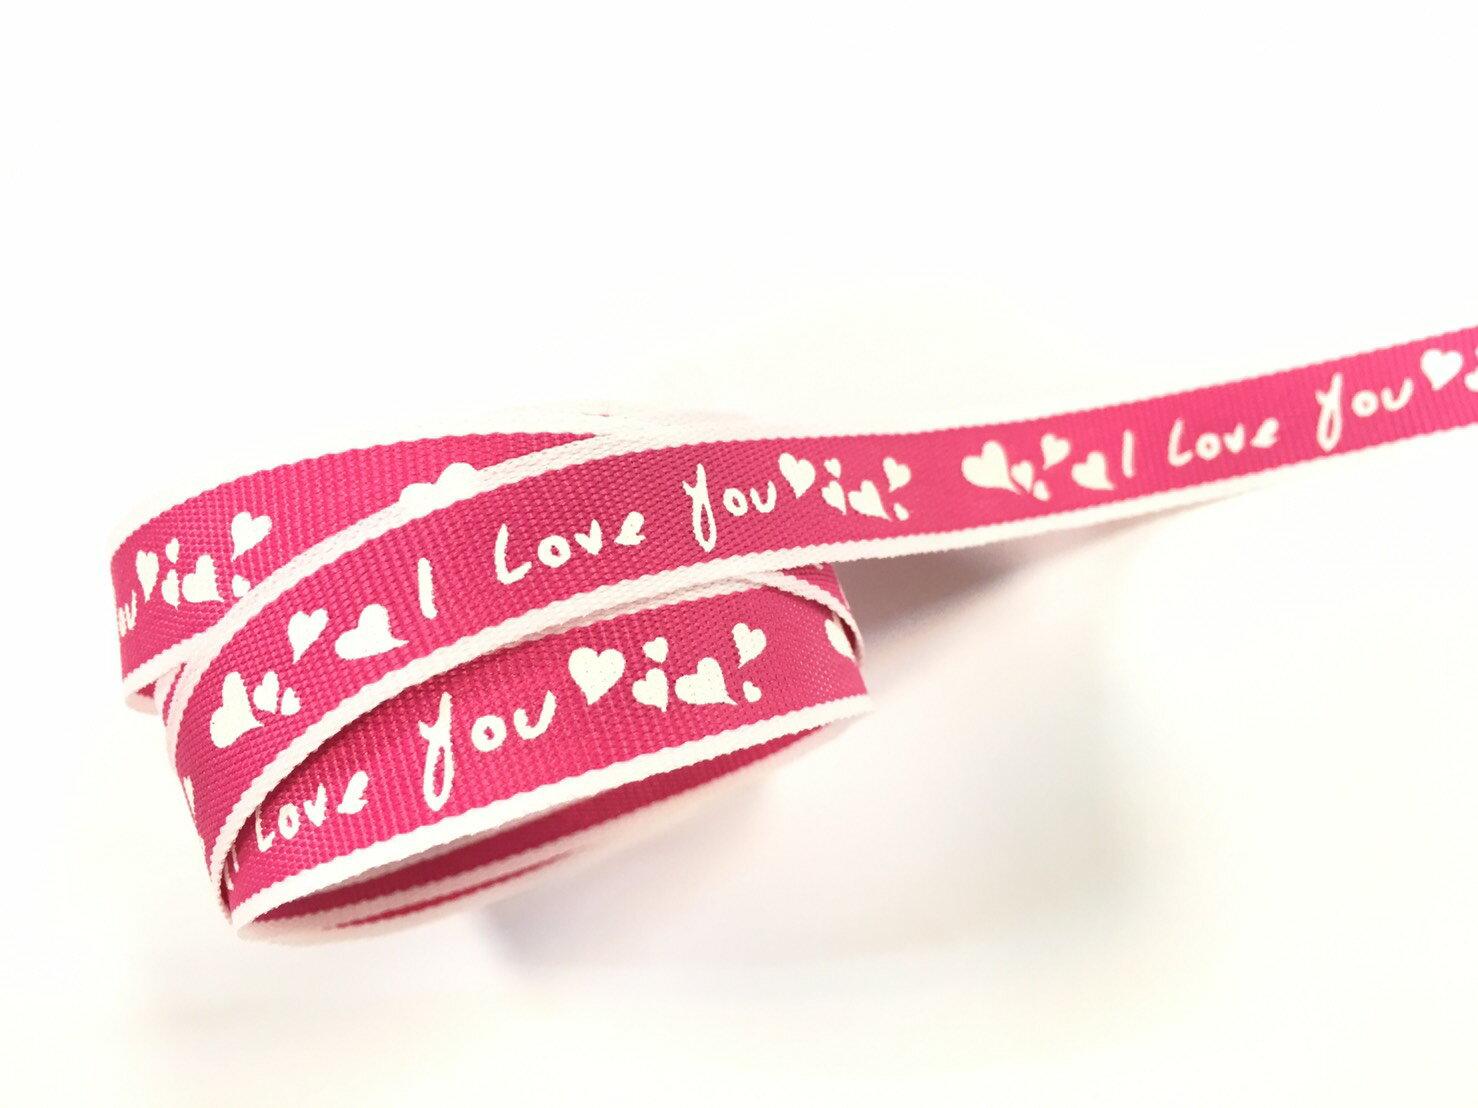 【Crystal Rose緞帶專賣店】love 愛心緞帶 12mm 3碼 (9色) 0